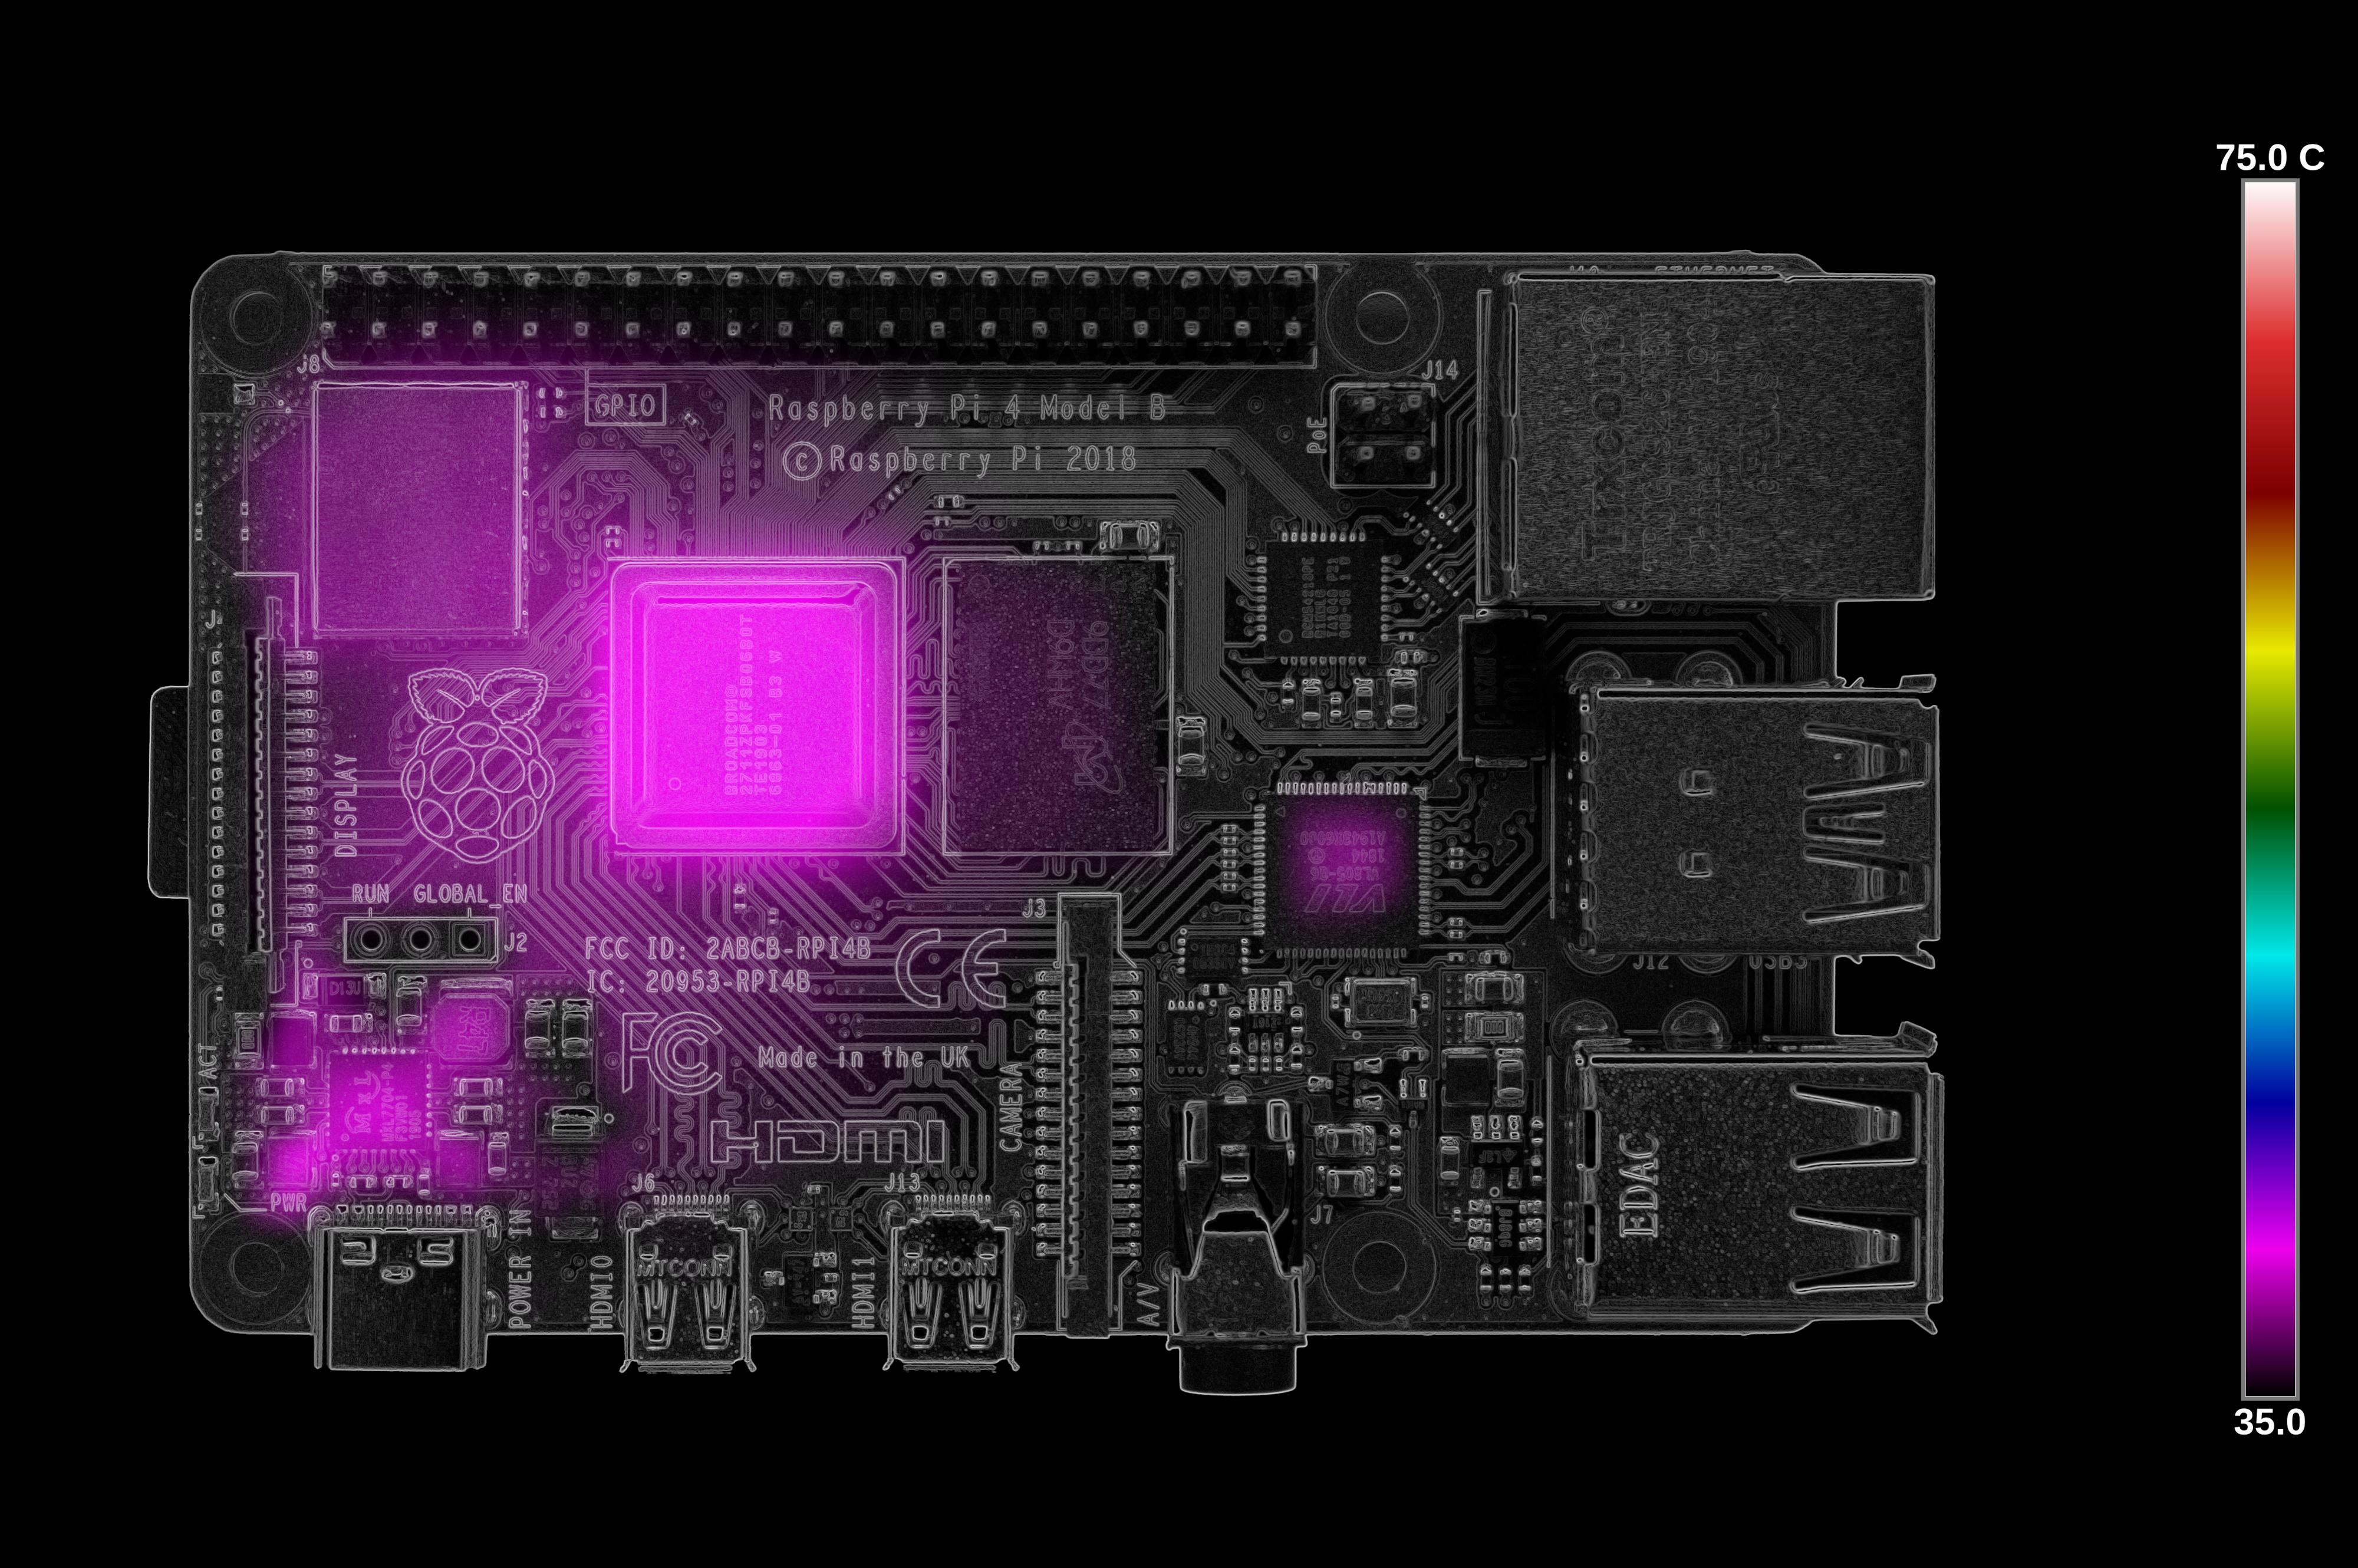 Тестирование Raspberry Pi 4 на нагрев - 28